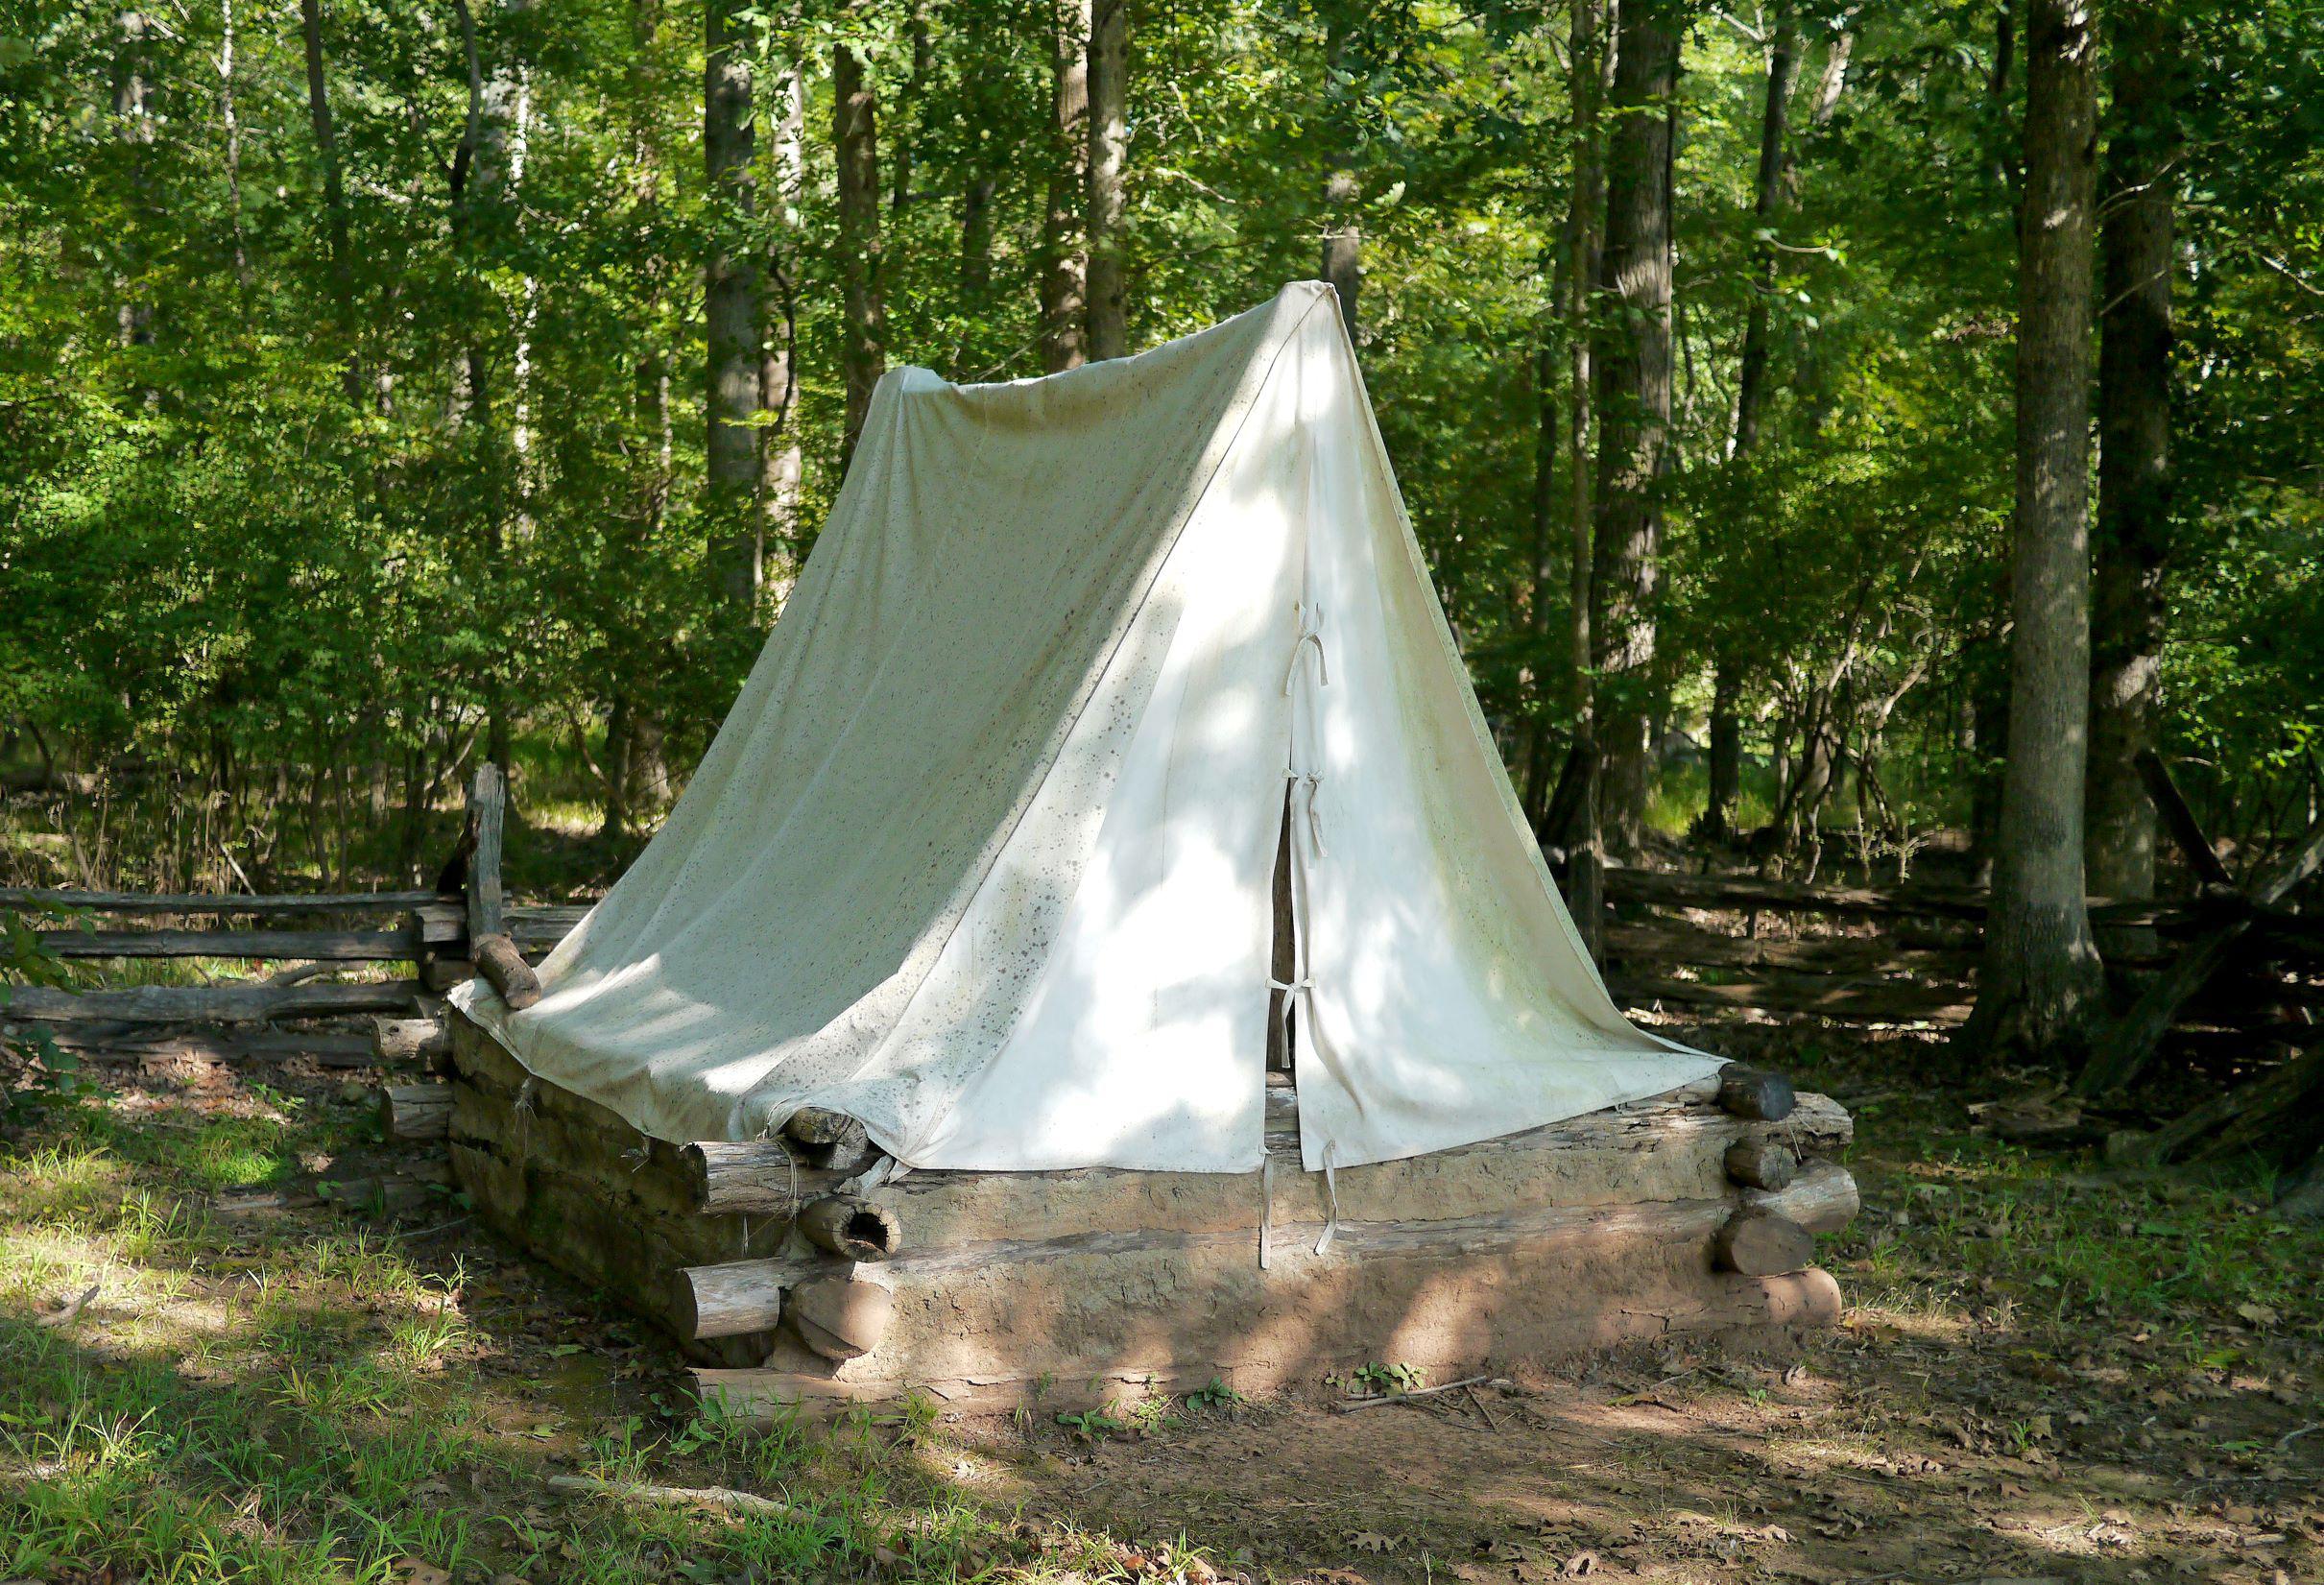 Union Civil War Field Shelter